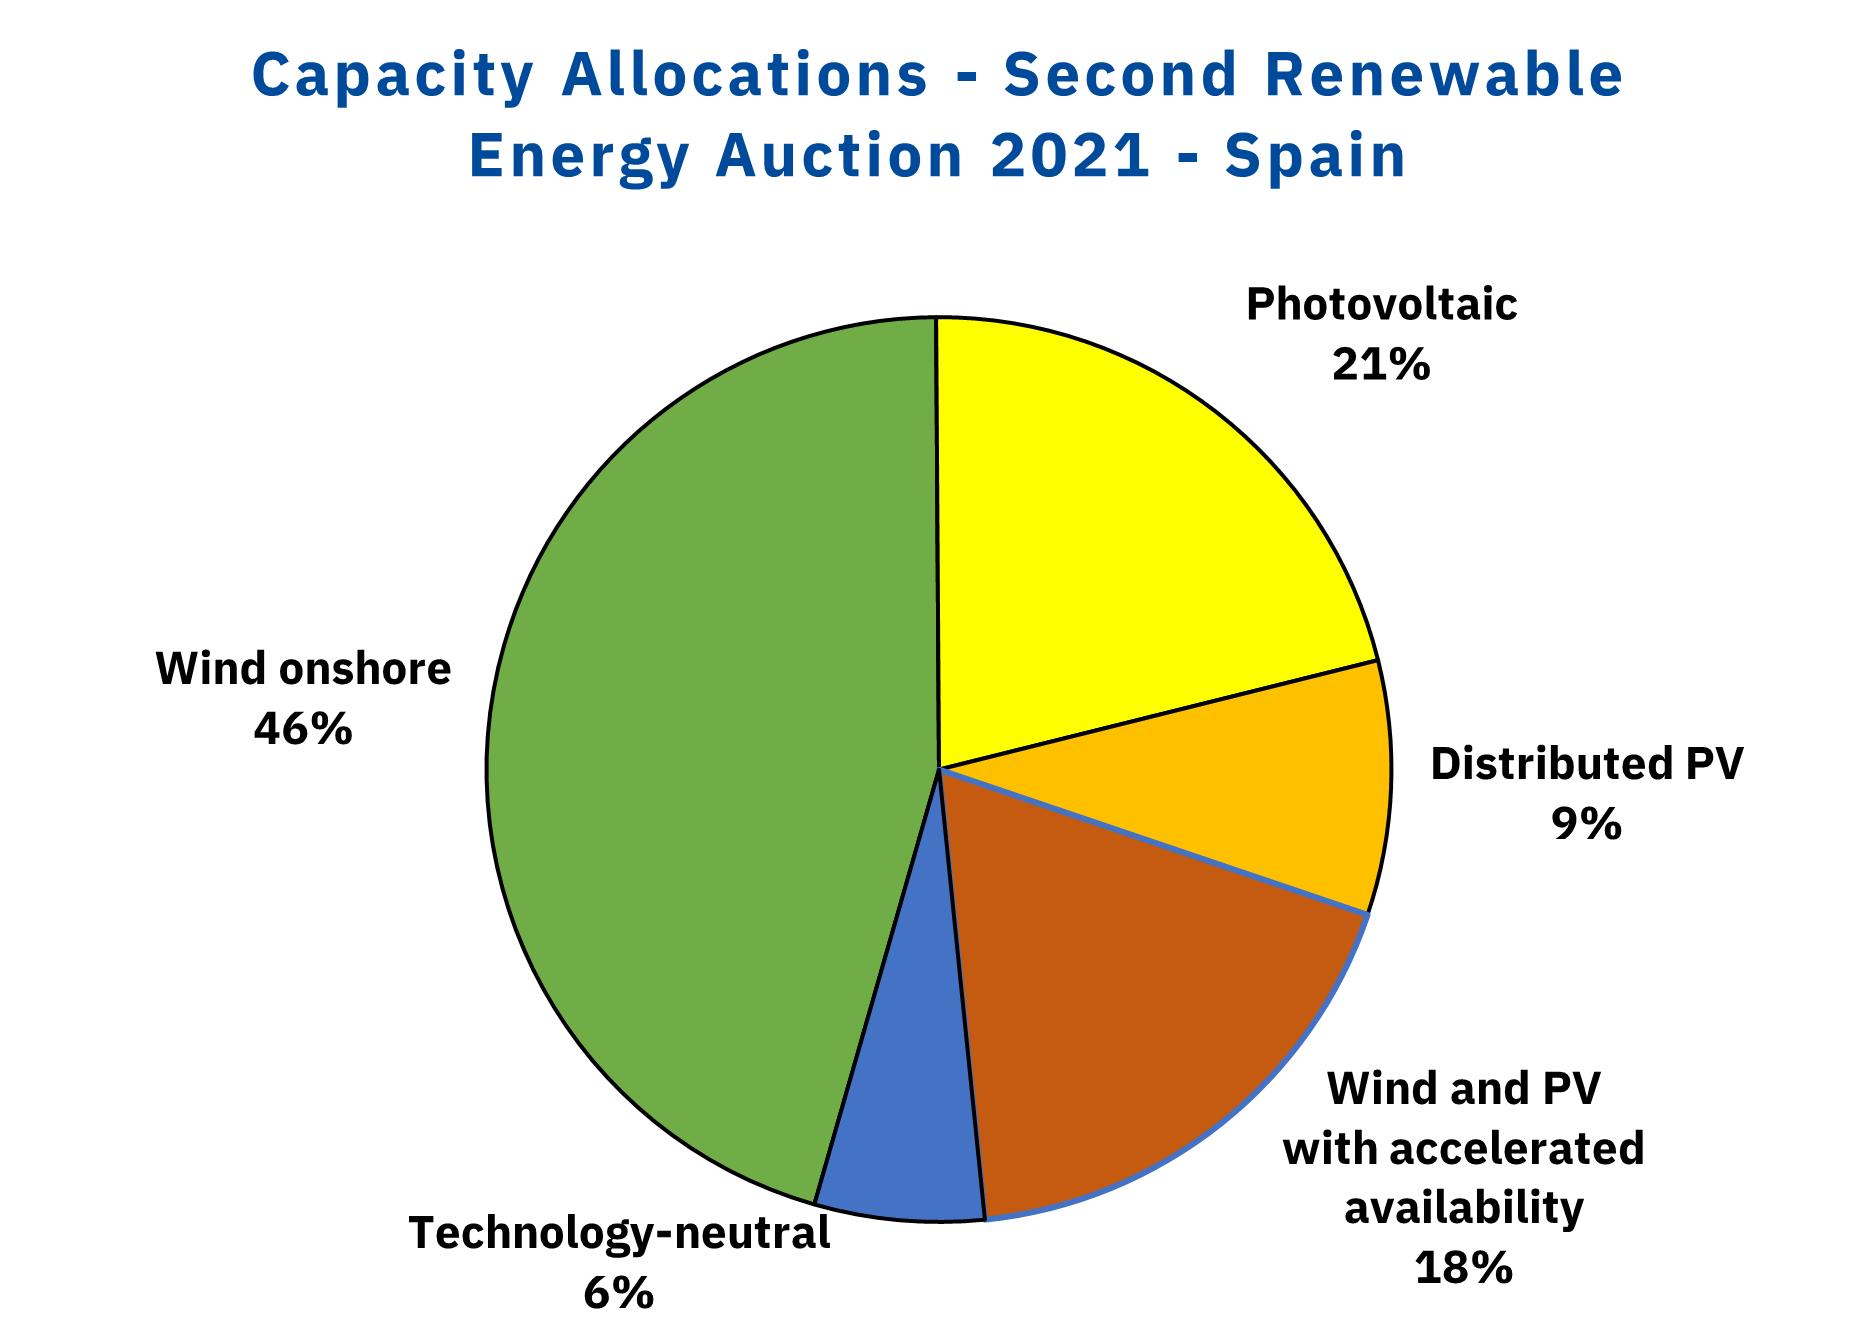 AleaSoft - Renewable energies auction